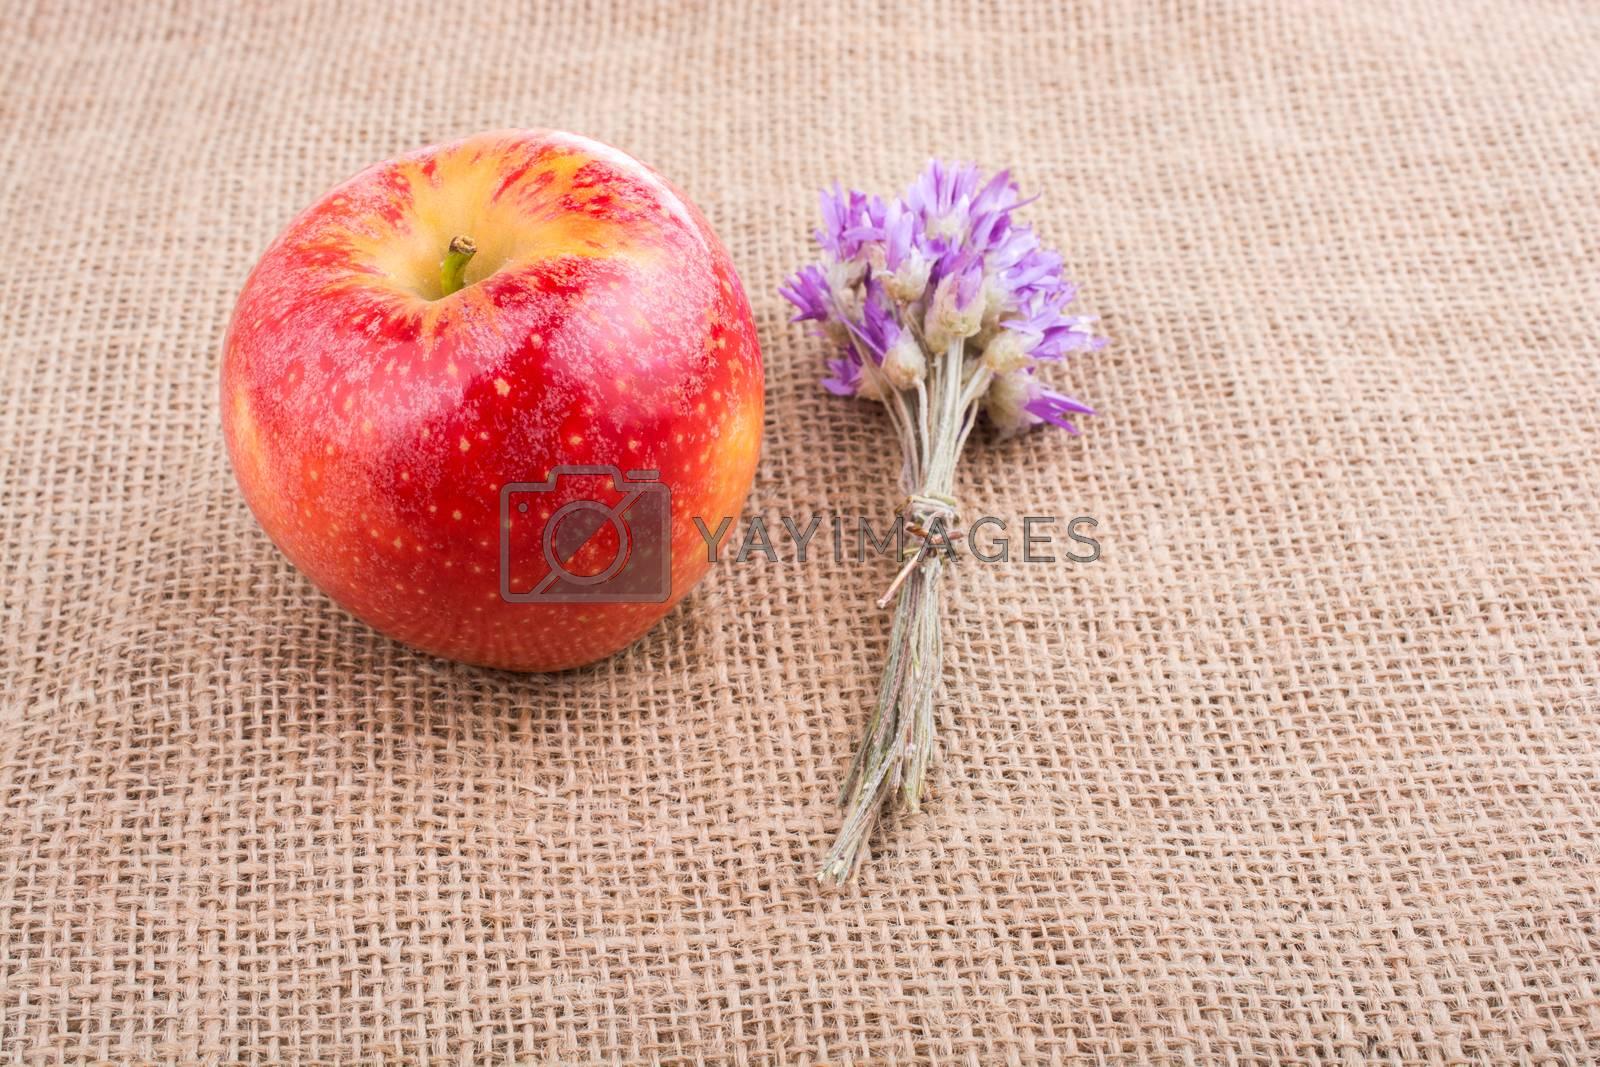 Tiny  flower bouquet beside  an apple on canvas